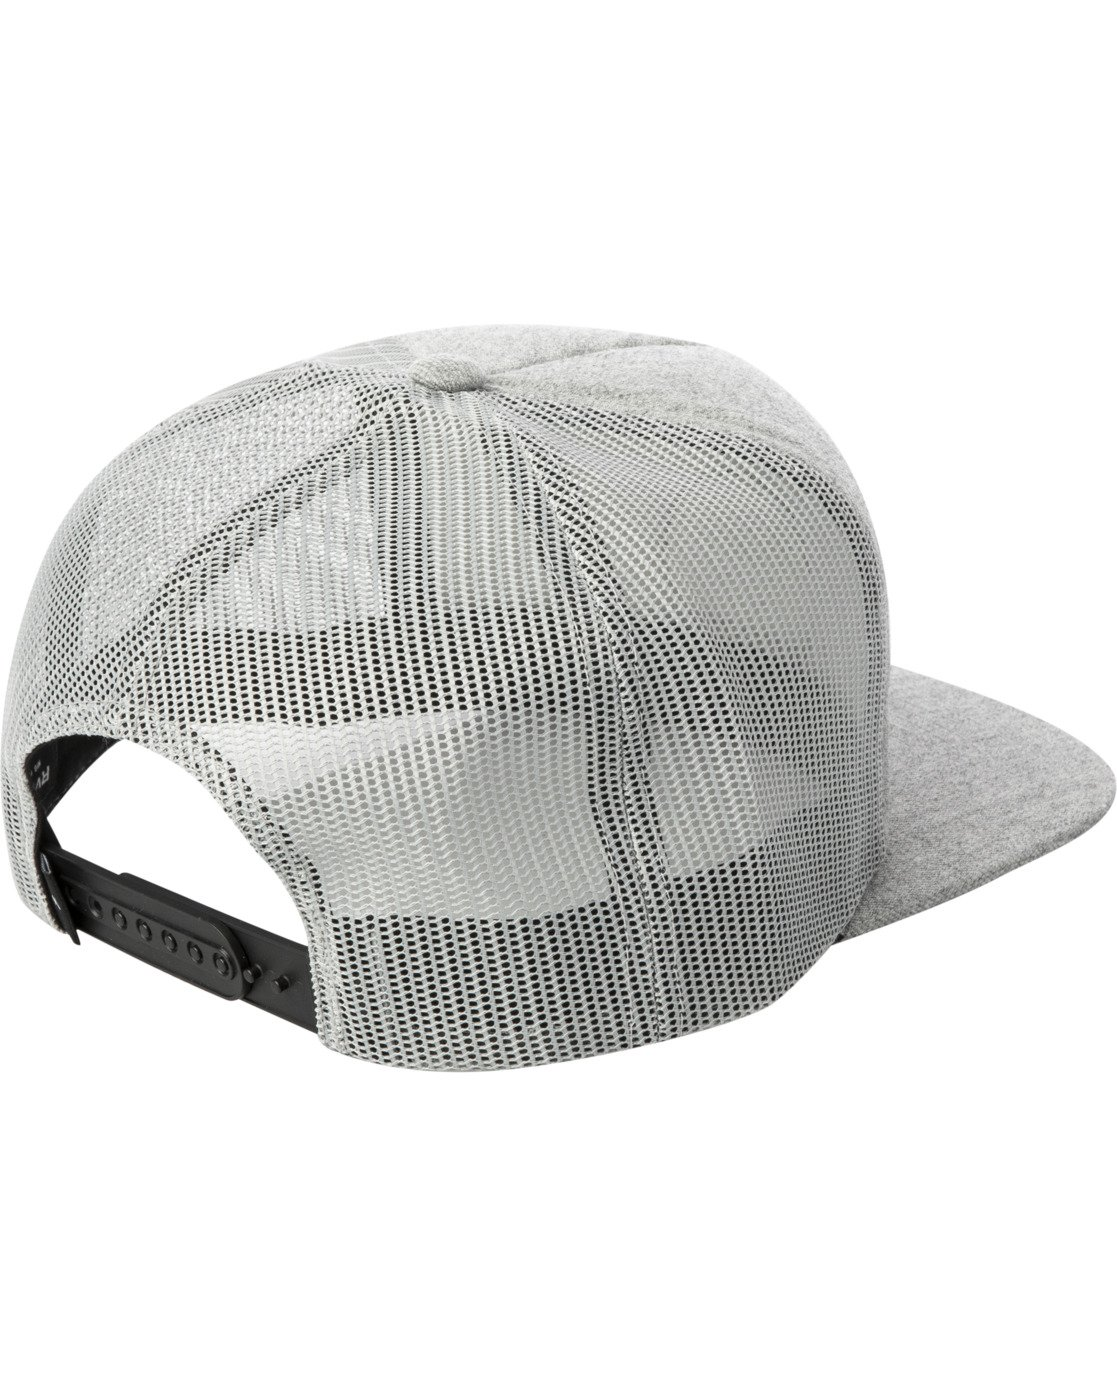 1 CENTERS TRUCKER HAT Grey AVYHA00143 RVCA